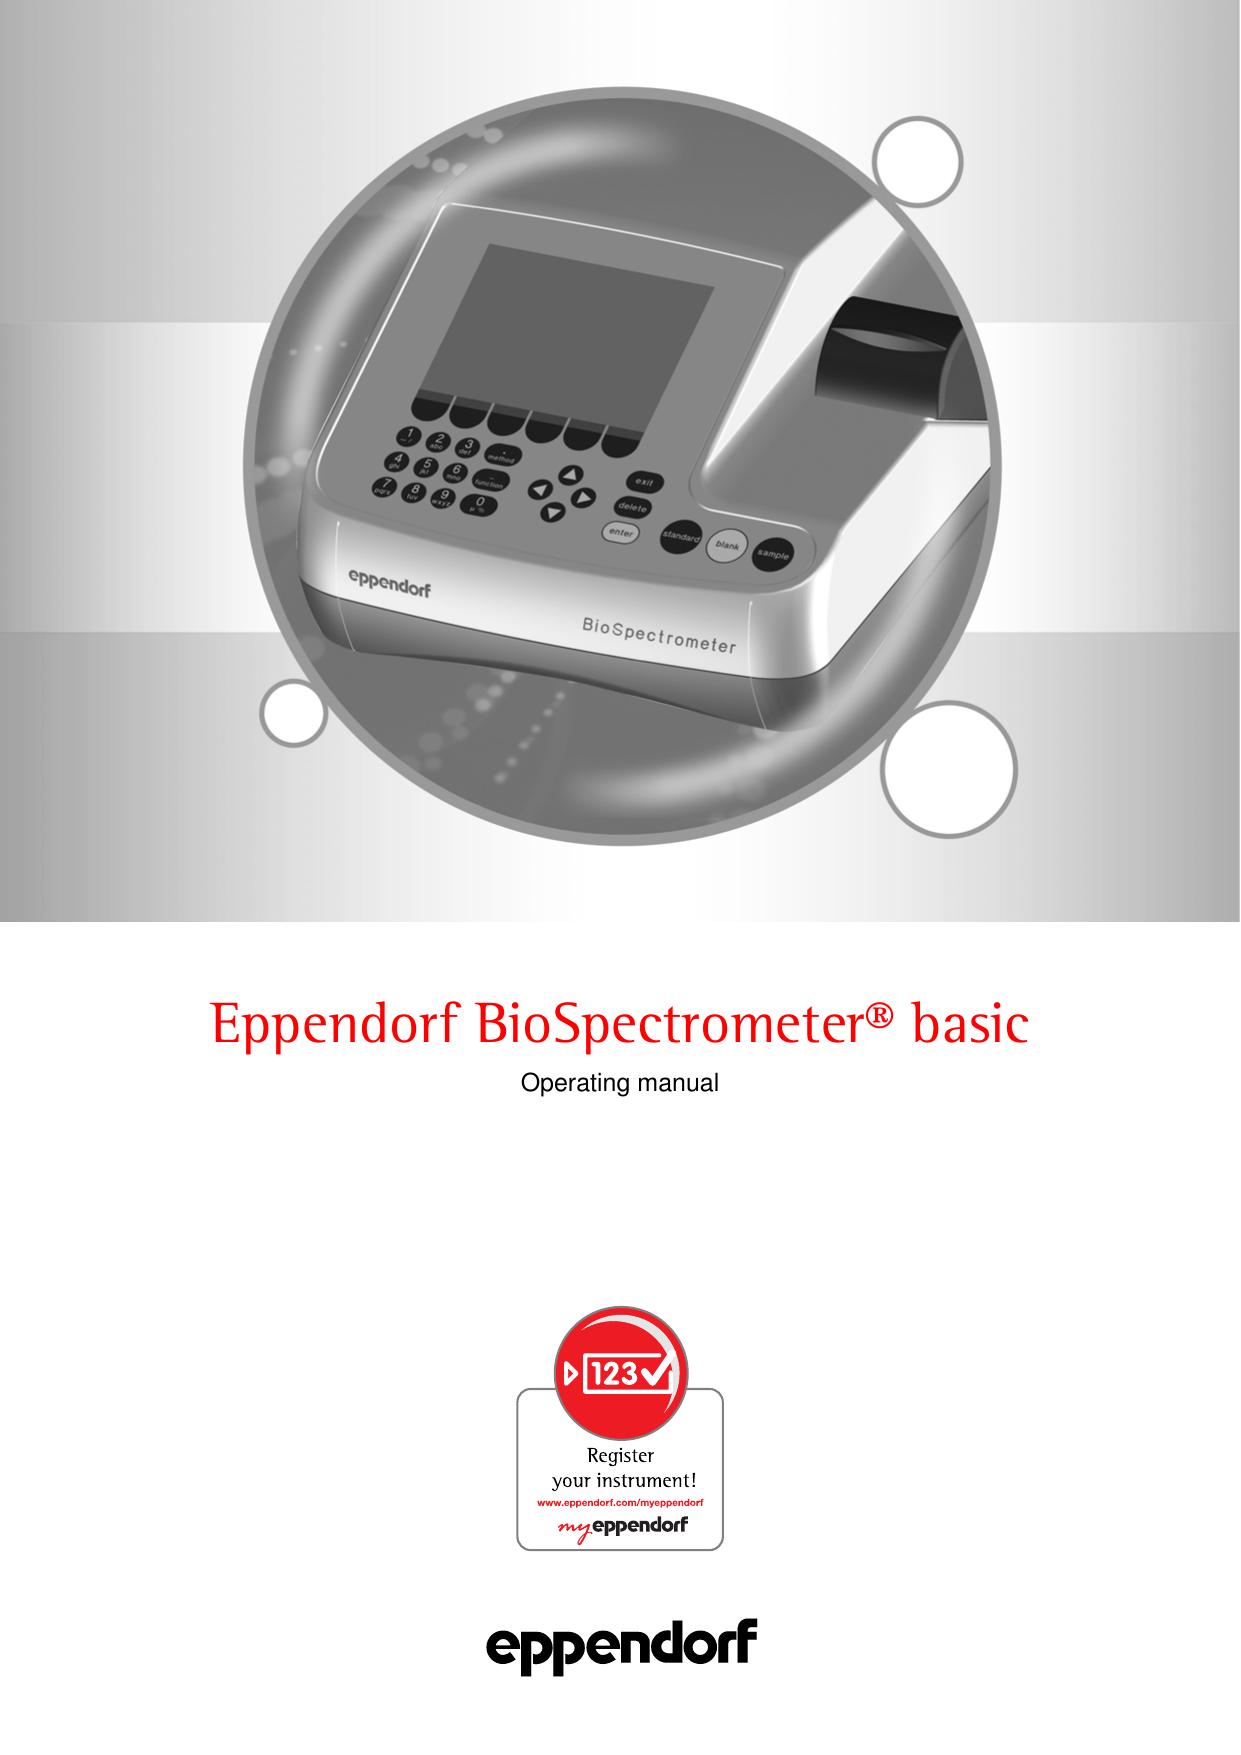 Eppendorf 6135928001 BioSpectrometer Reference Filter Set Eppendorf North America